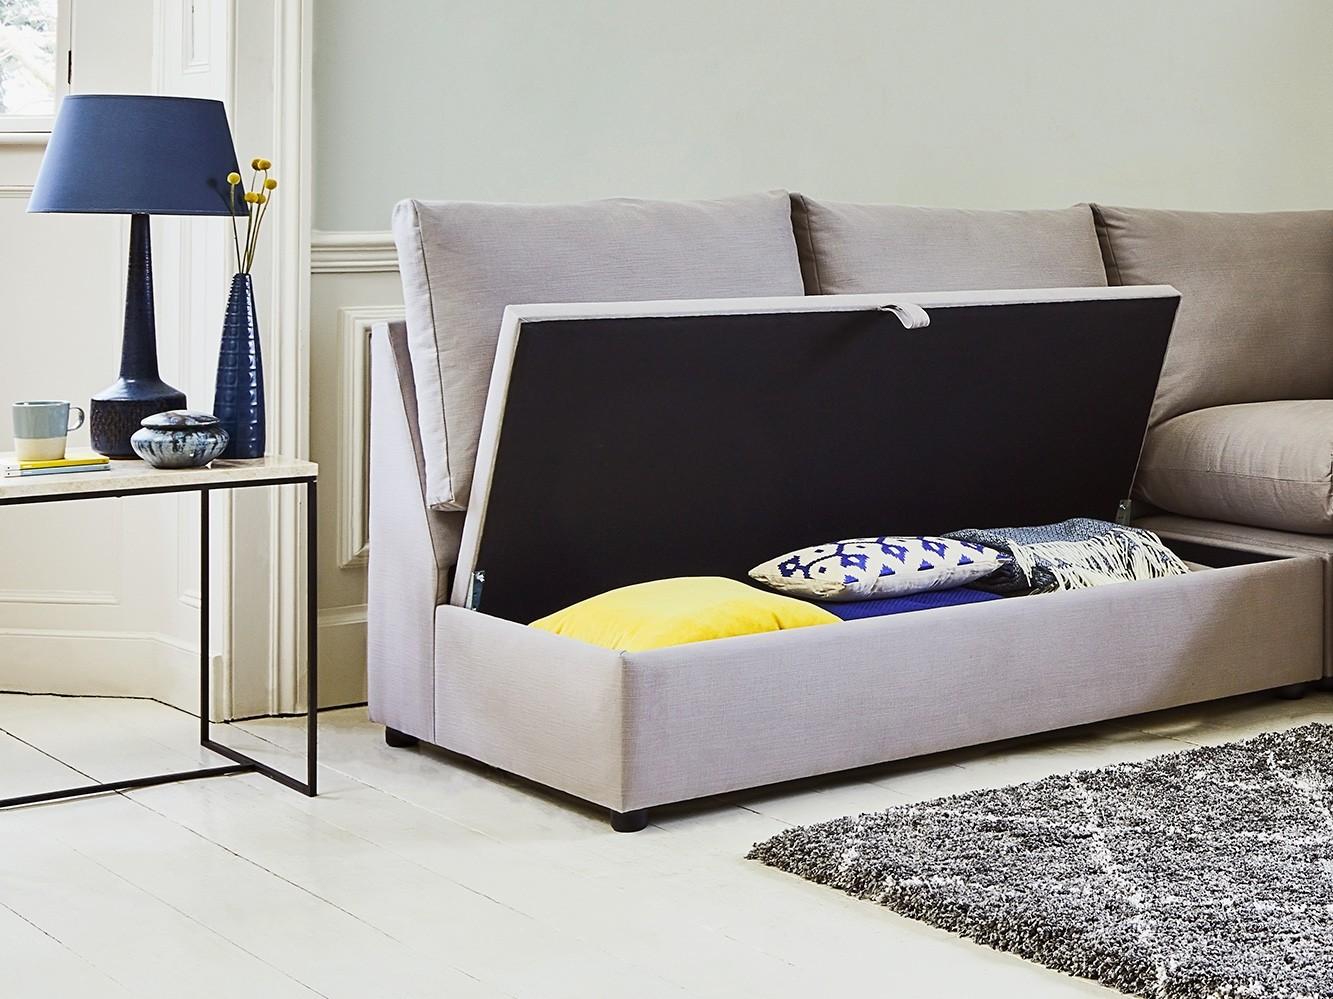 The Minety Modular Corner Storage Sofa Bed